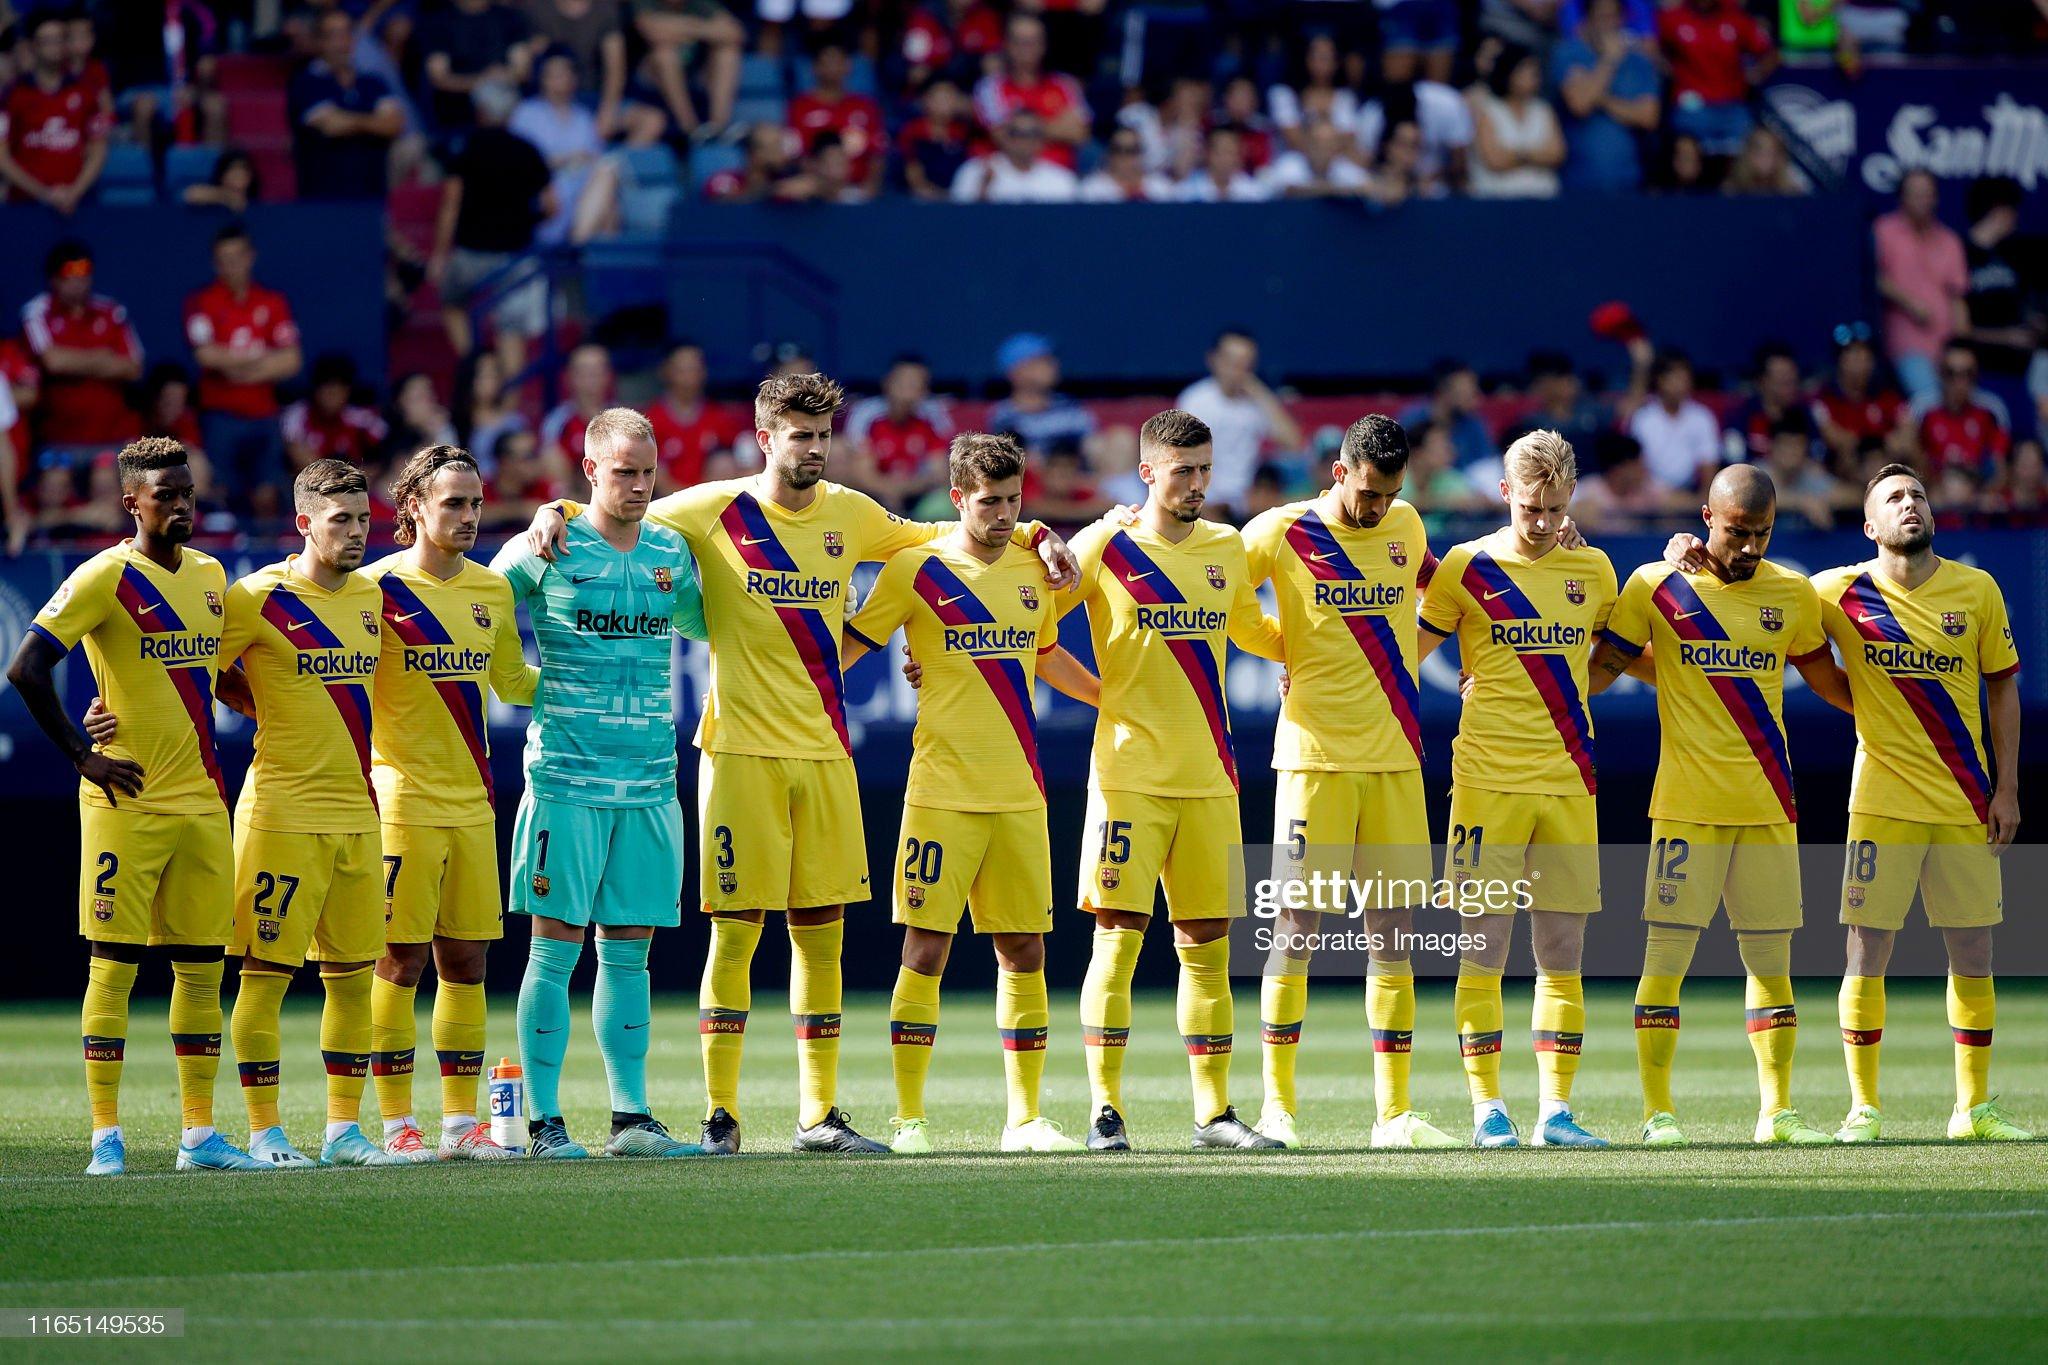 صور مباراة : أوساسونا - برشلونة 2-2 ( 31-08-2019 )  Players-of-fc-barcelona-stands-for-a-minute-of-silence-during-the-la-picture-id1165149535?s=2048x2048